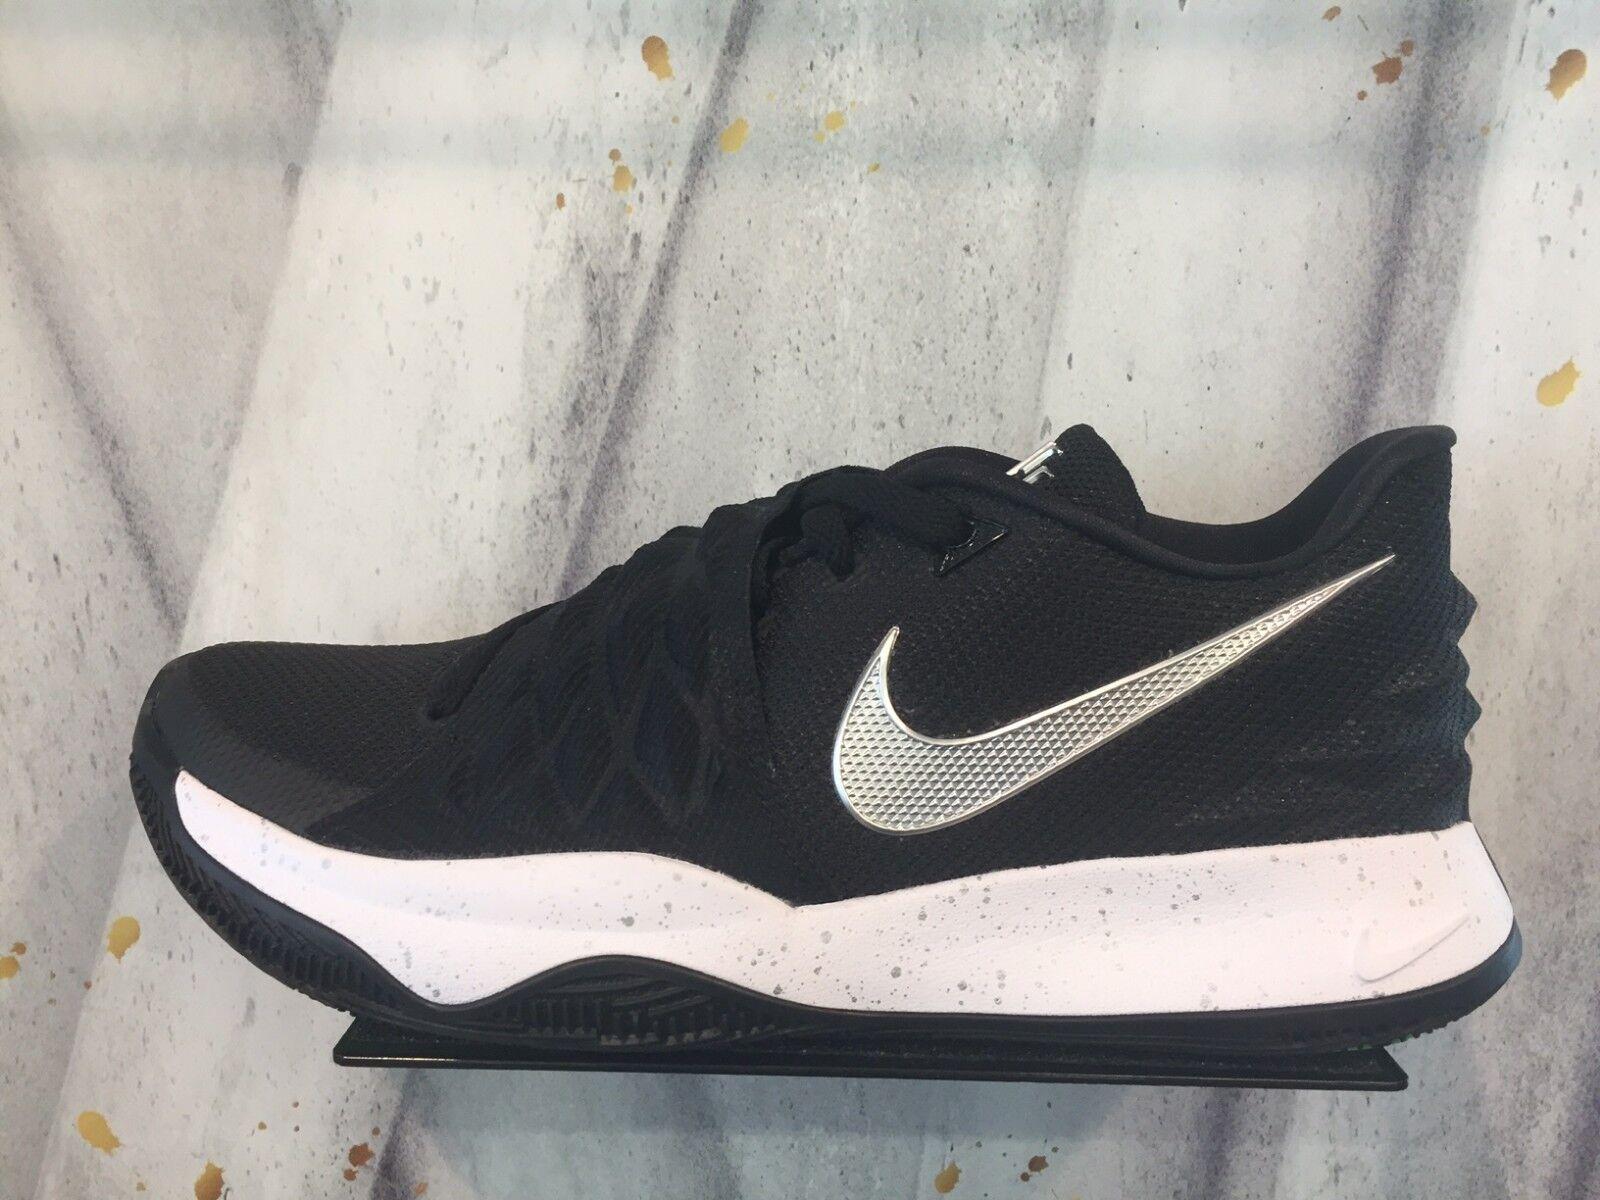 Nike kyrie niedrig 1 schwarz metallic silber - sz - 8 - silber 13 neue ao8979-003 ds irving 00dafc